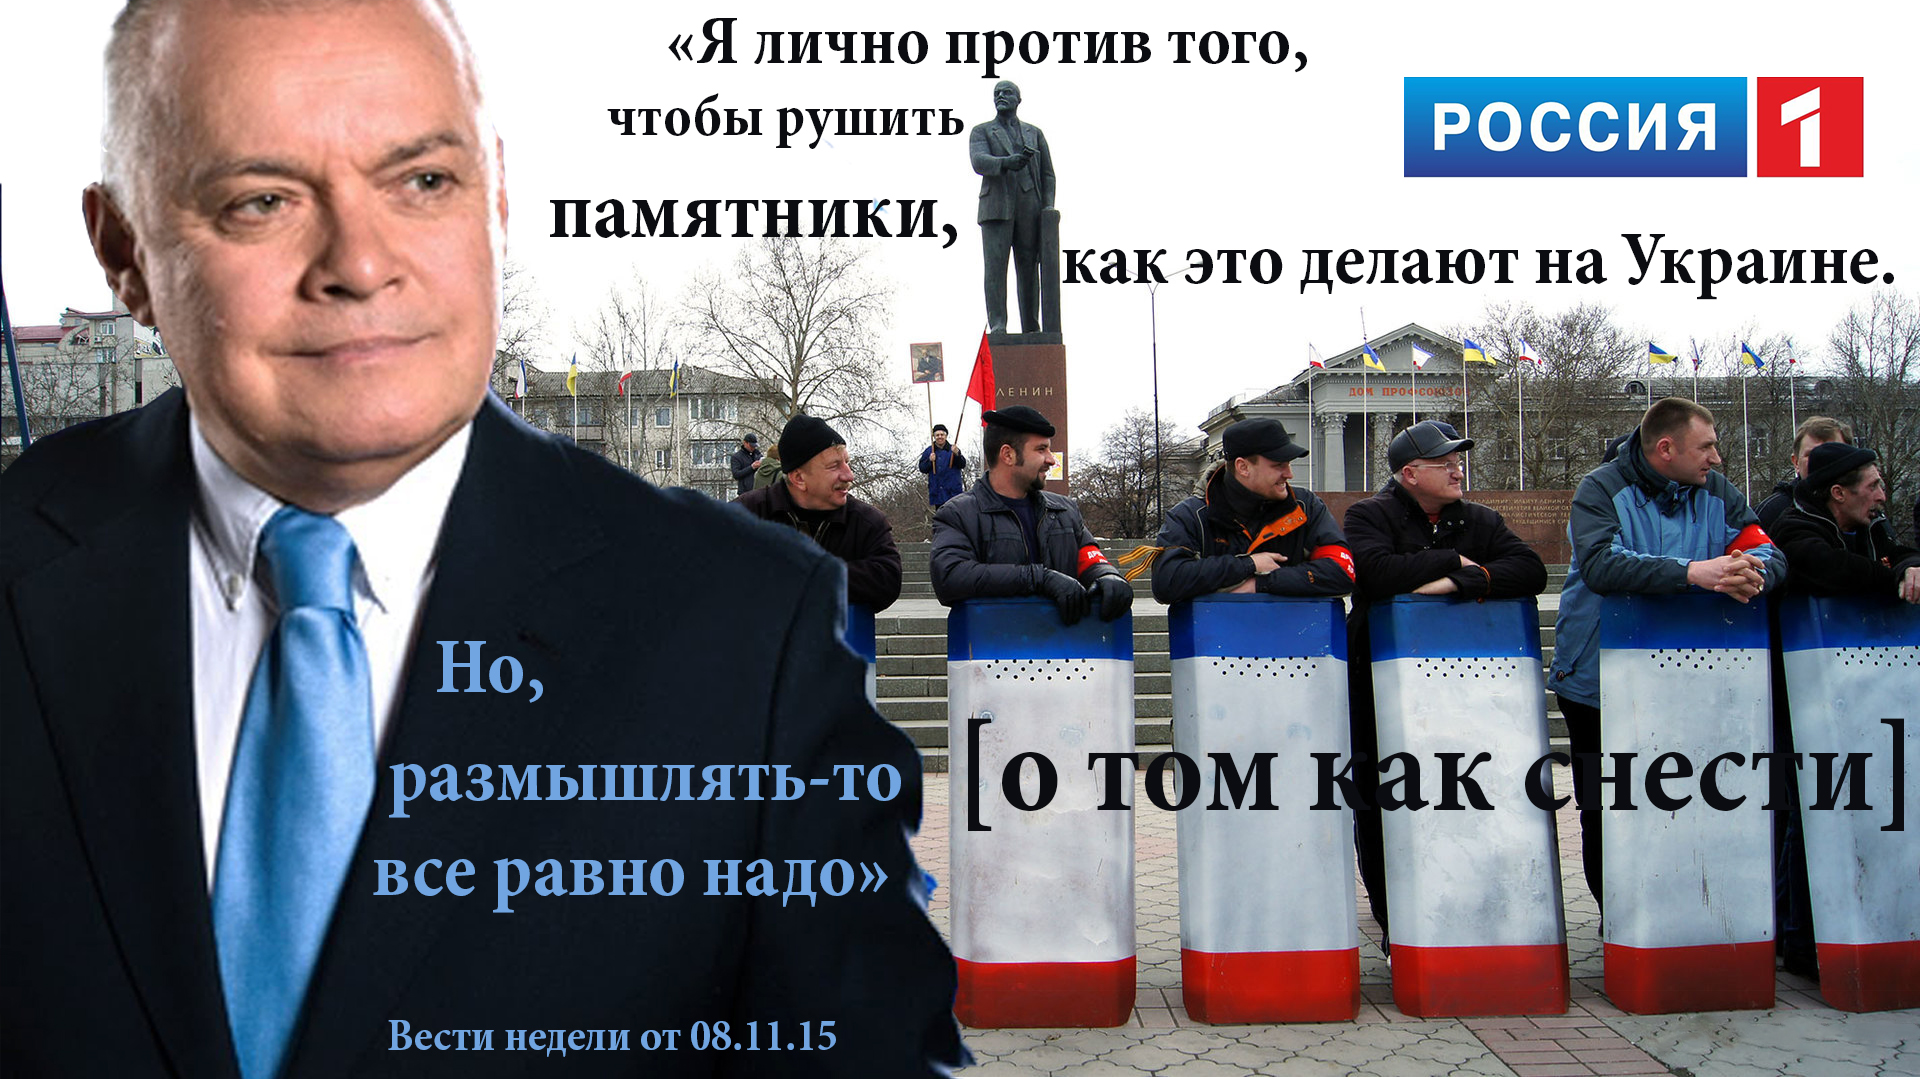 https://img-fotki.yandex.ru/get/9167/342252127.0/0_208b87_4dc8343e_orig